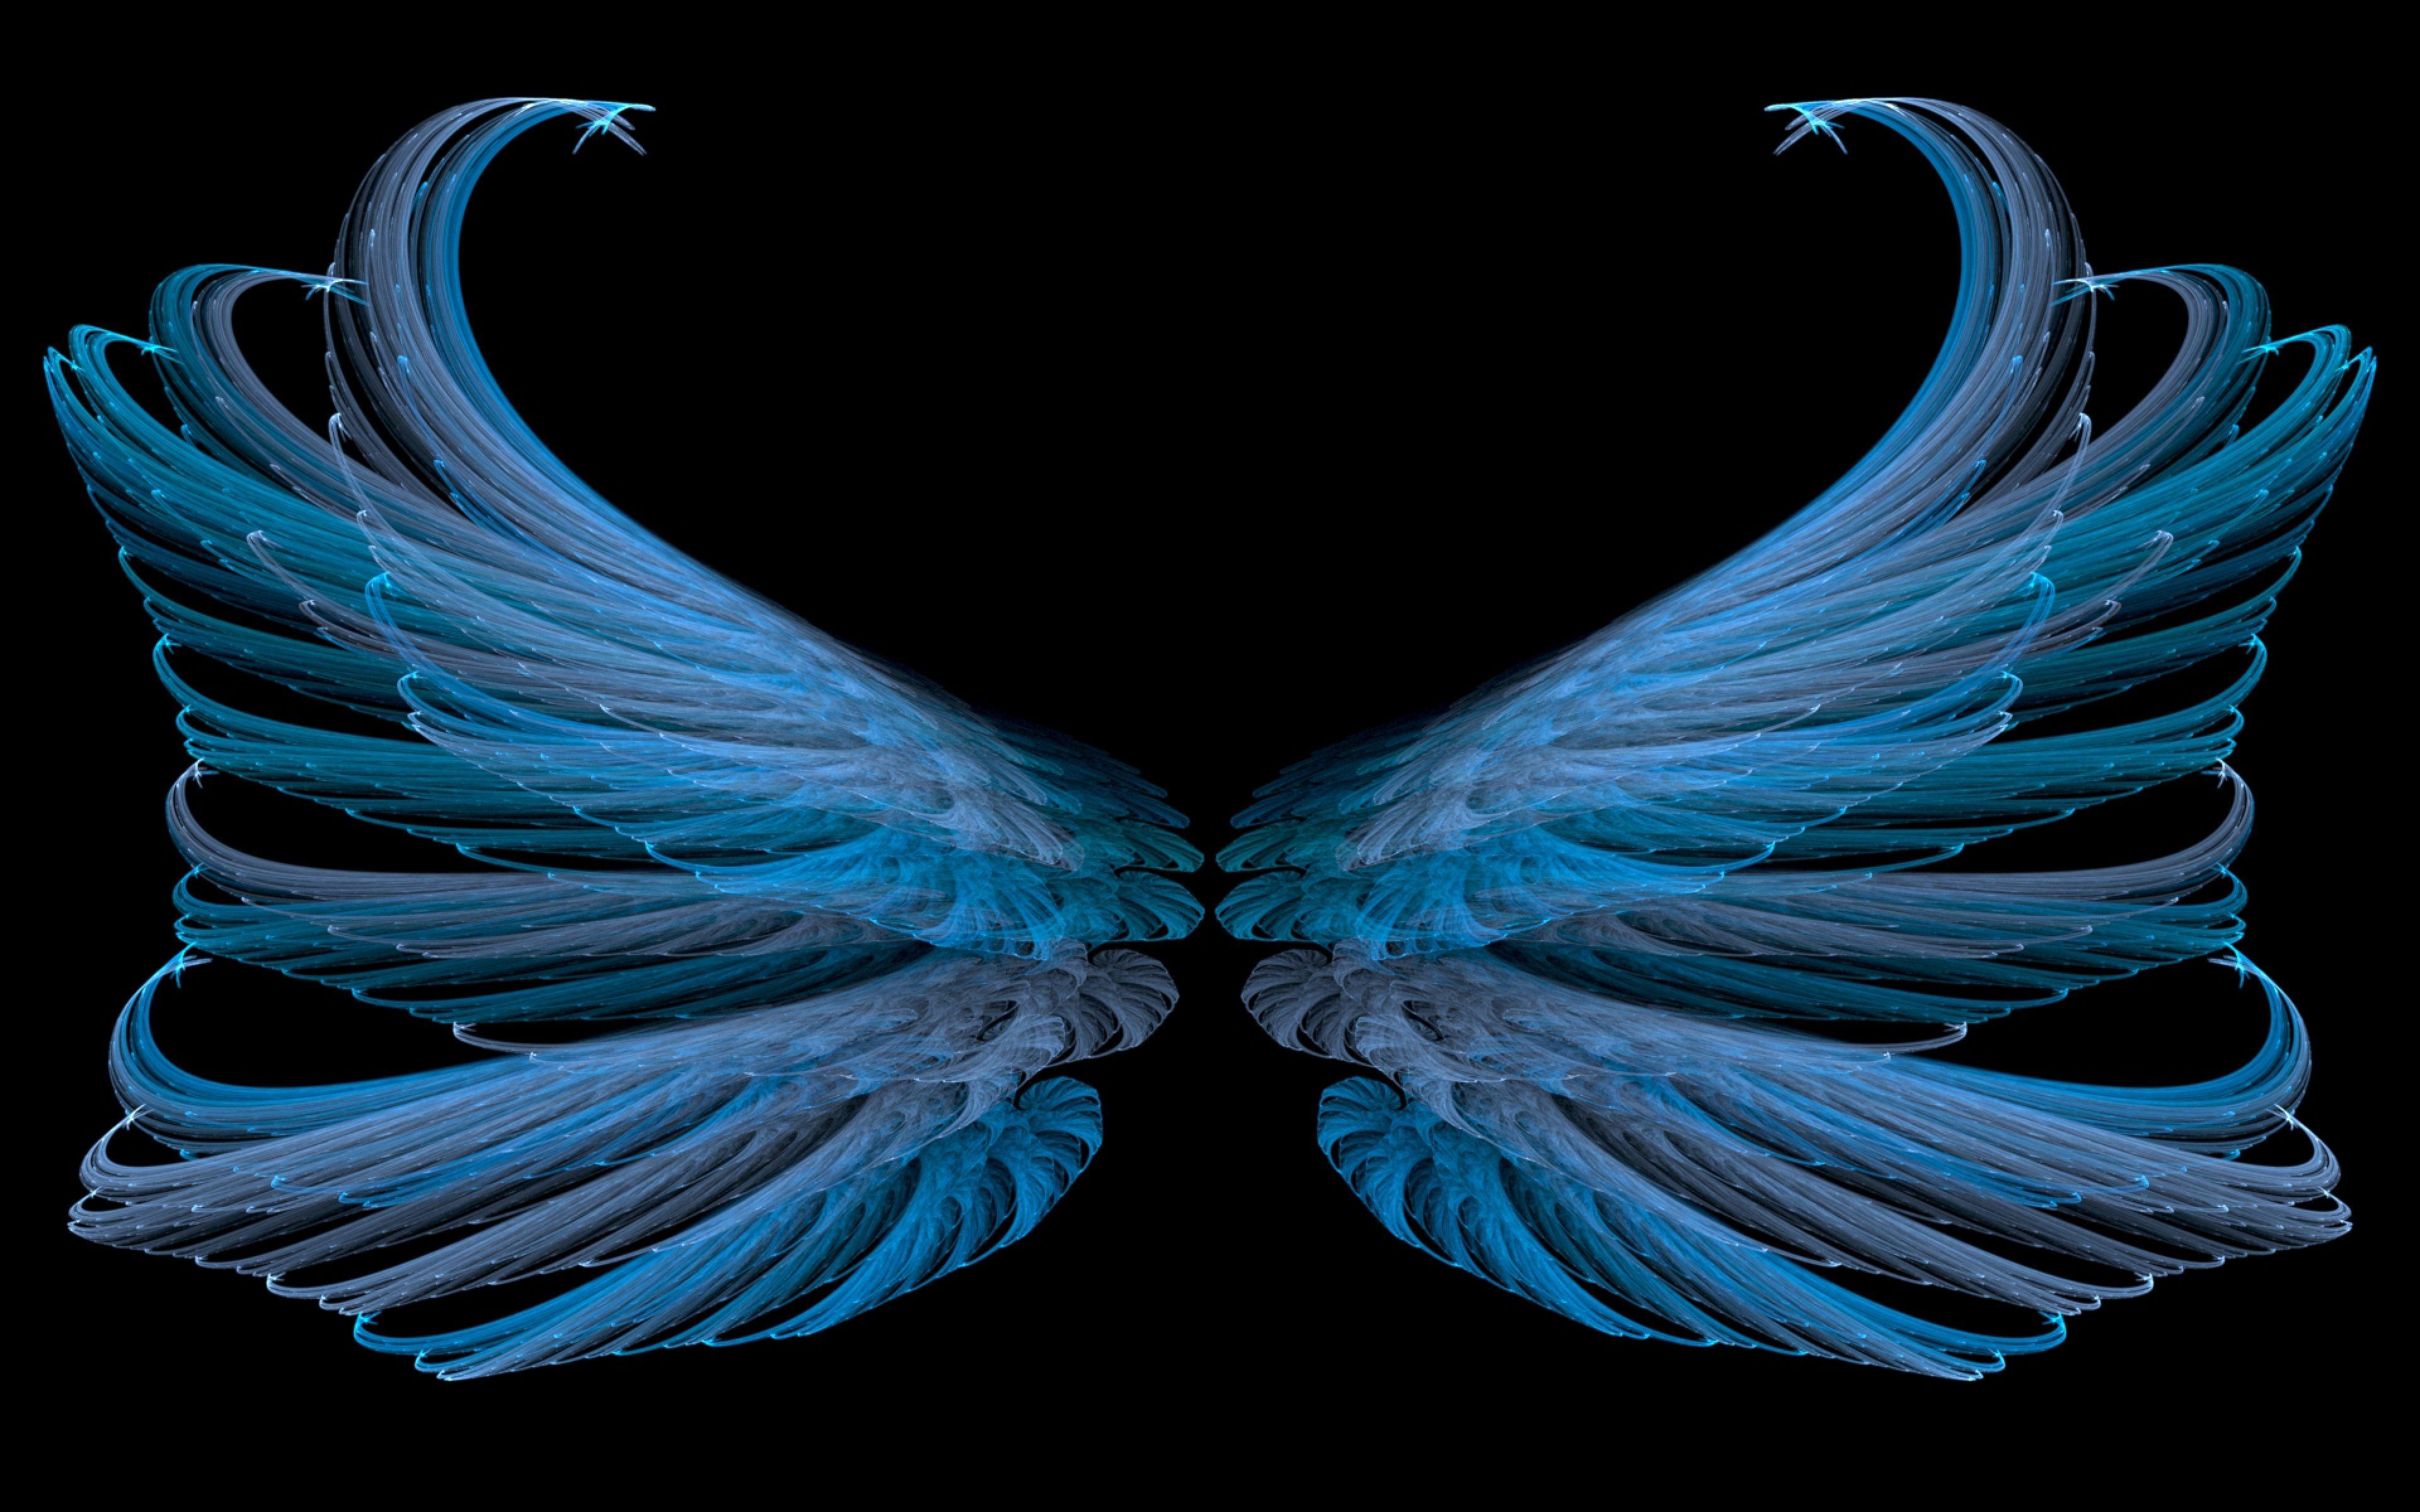 3840x2400 Wallpaper blue, black, wings, white, bright